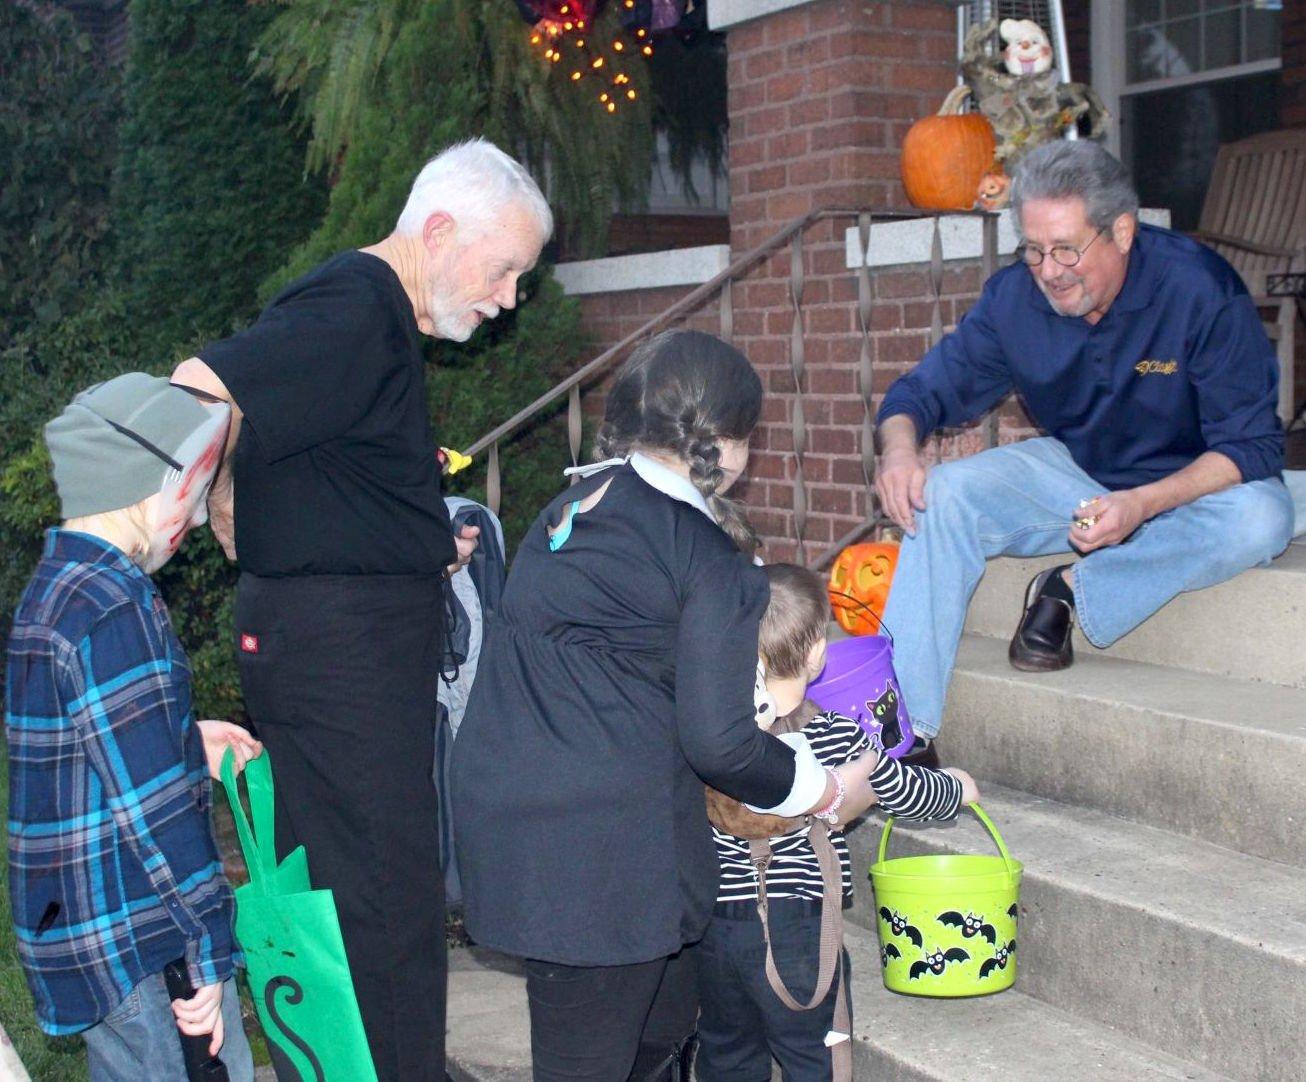 Halloween Activities 2020 Clarksburg Wv An individual choice: North Central West Virginia municipalities